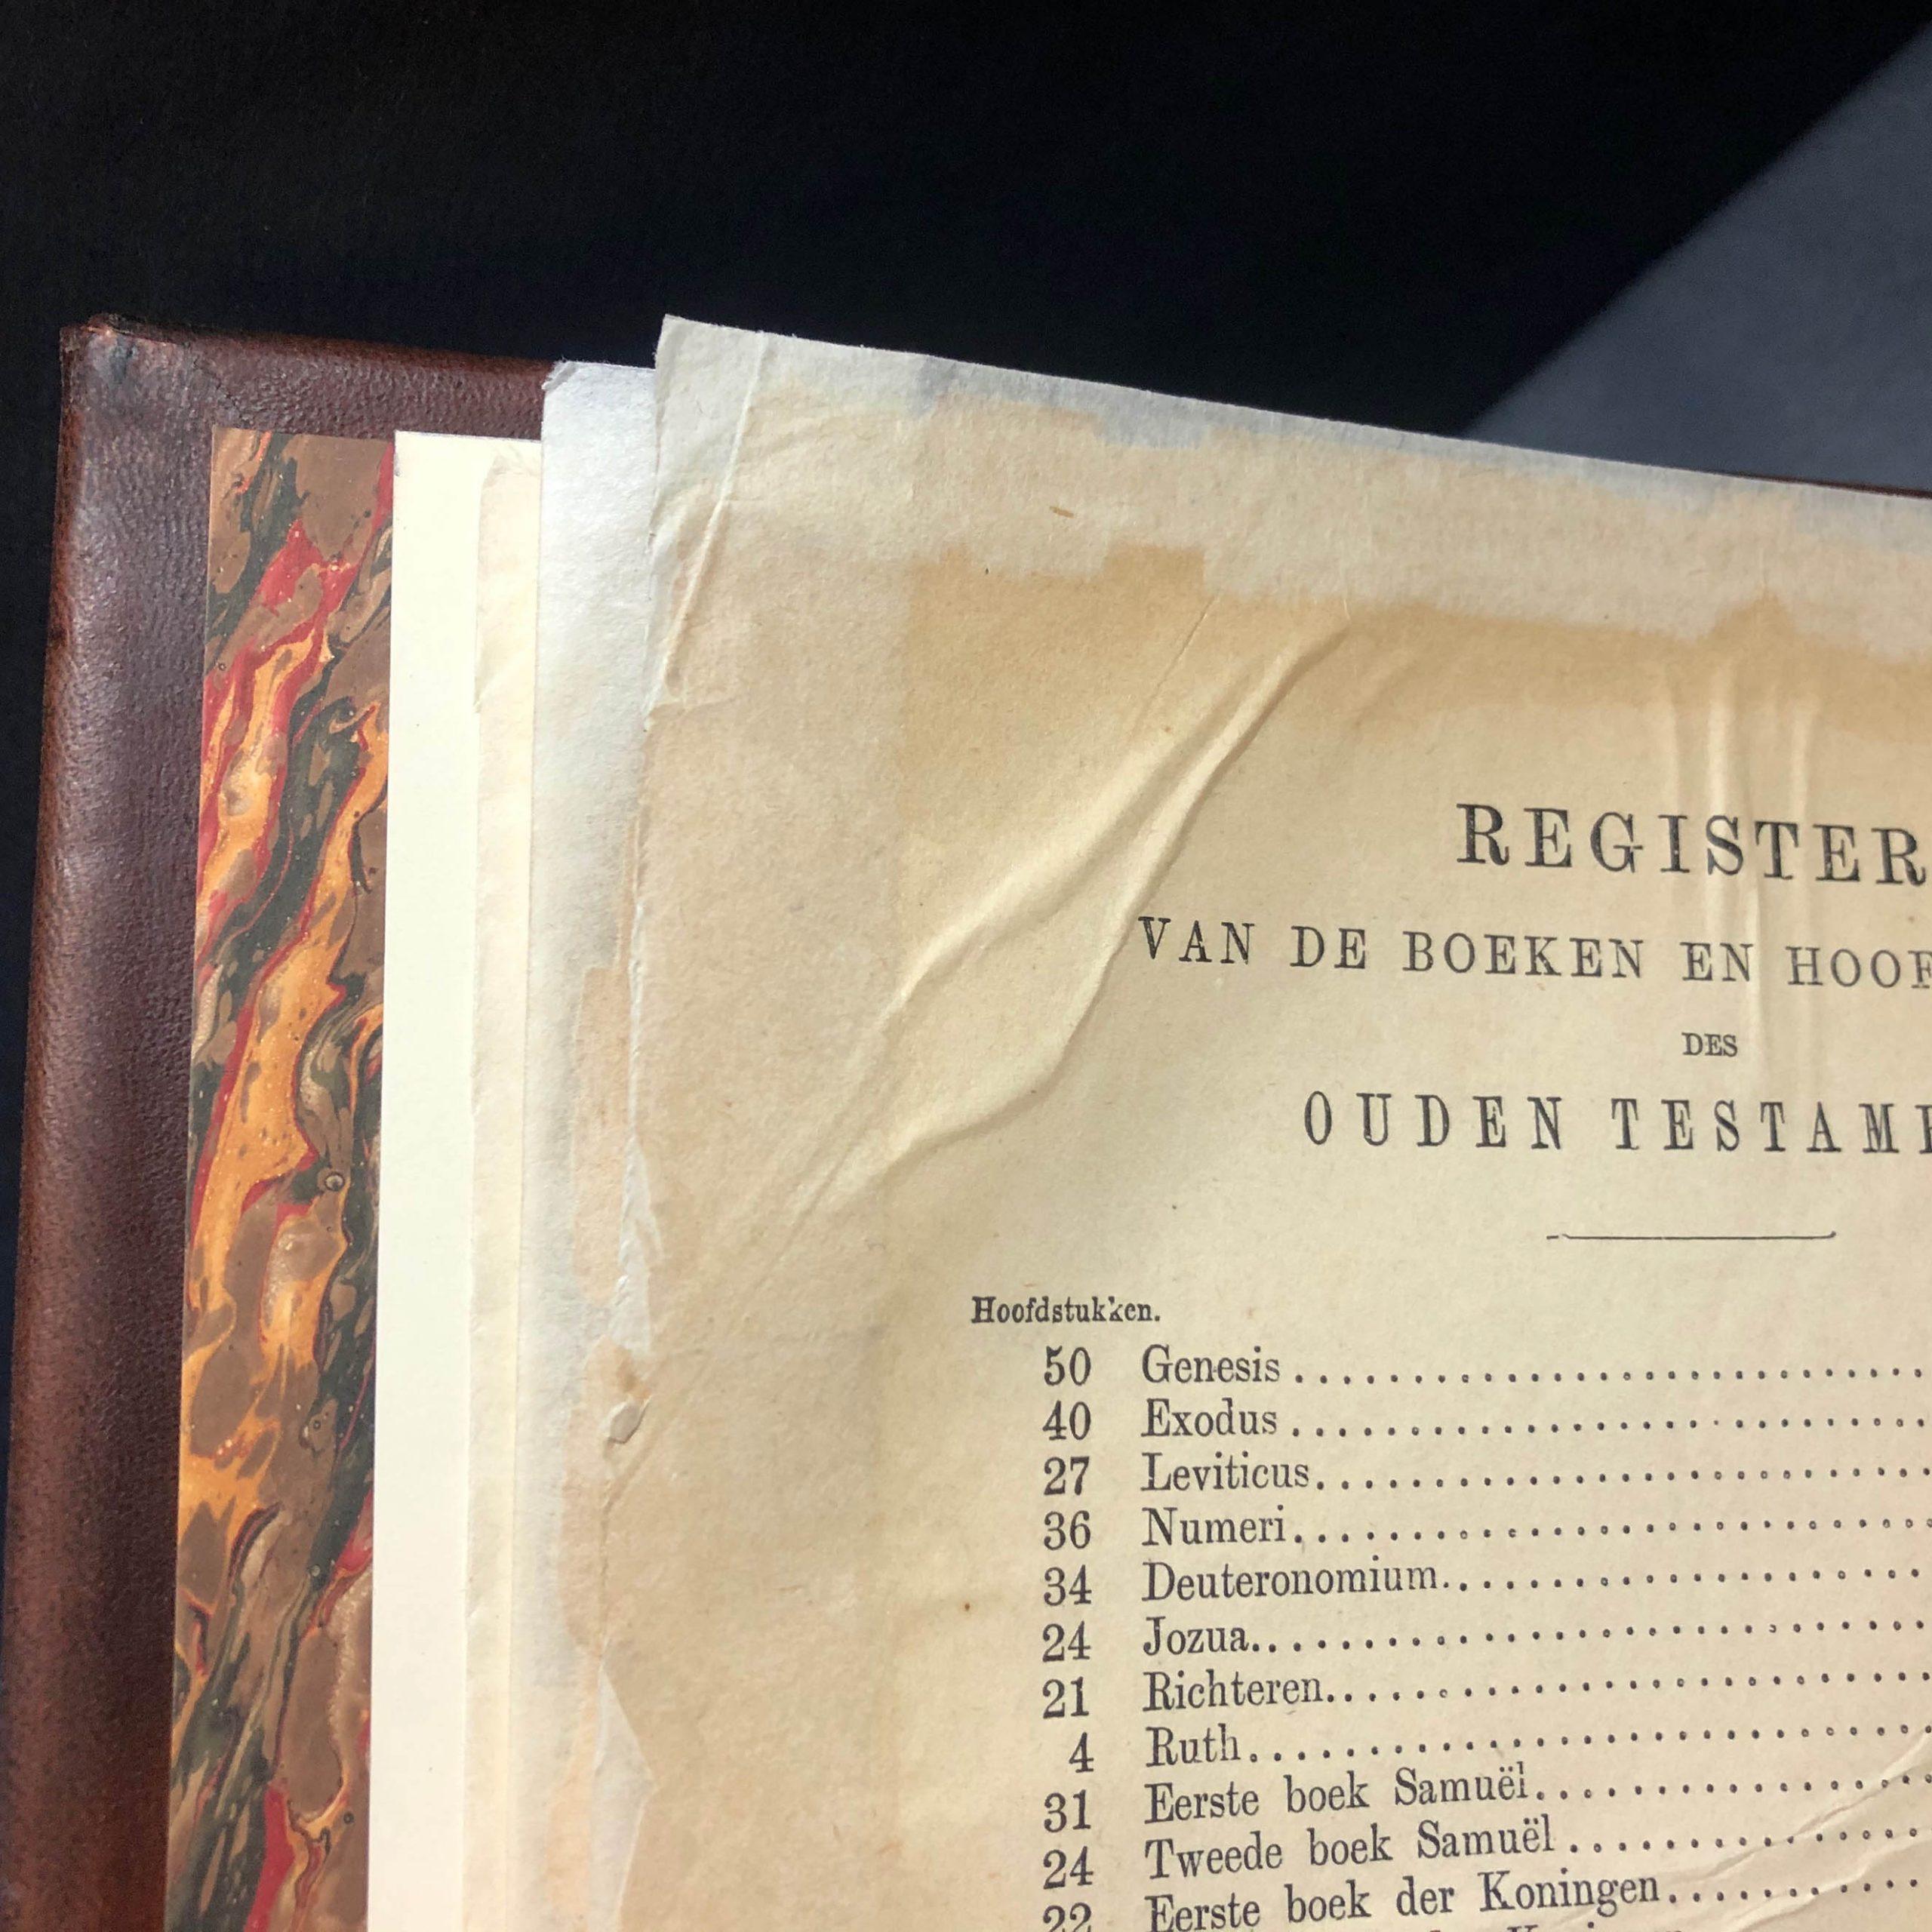 Bijbel Restoration Custom Leather Bound Book Boston Harbor Bookbindery https://bostonharborbooks.com/